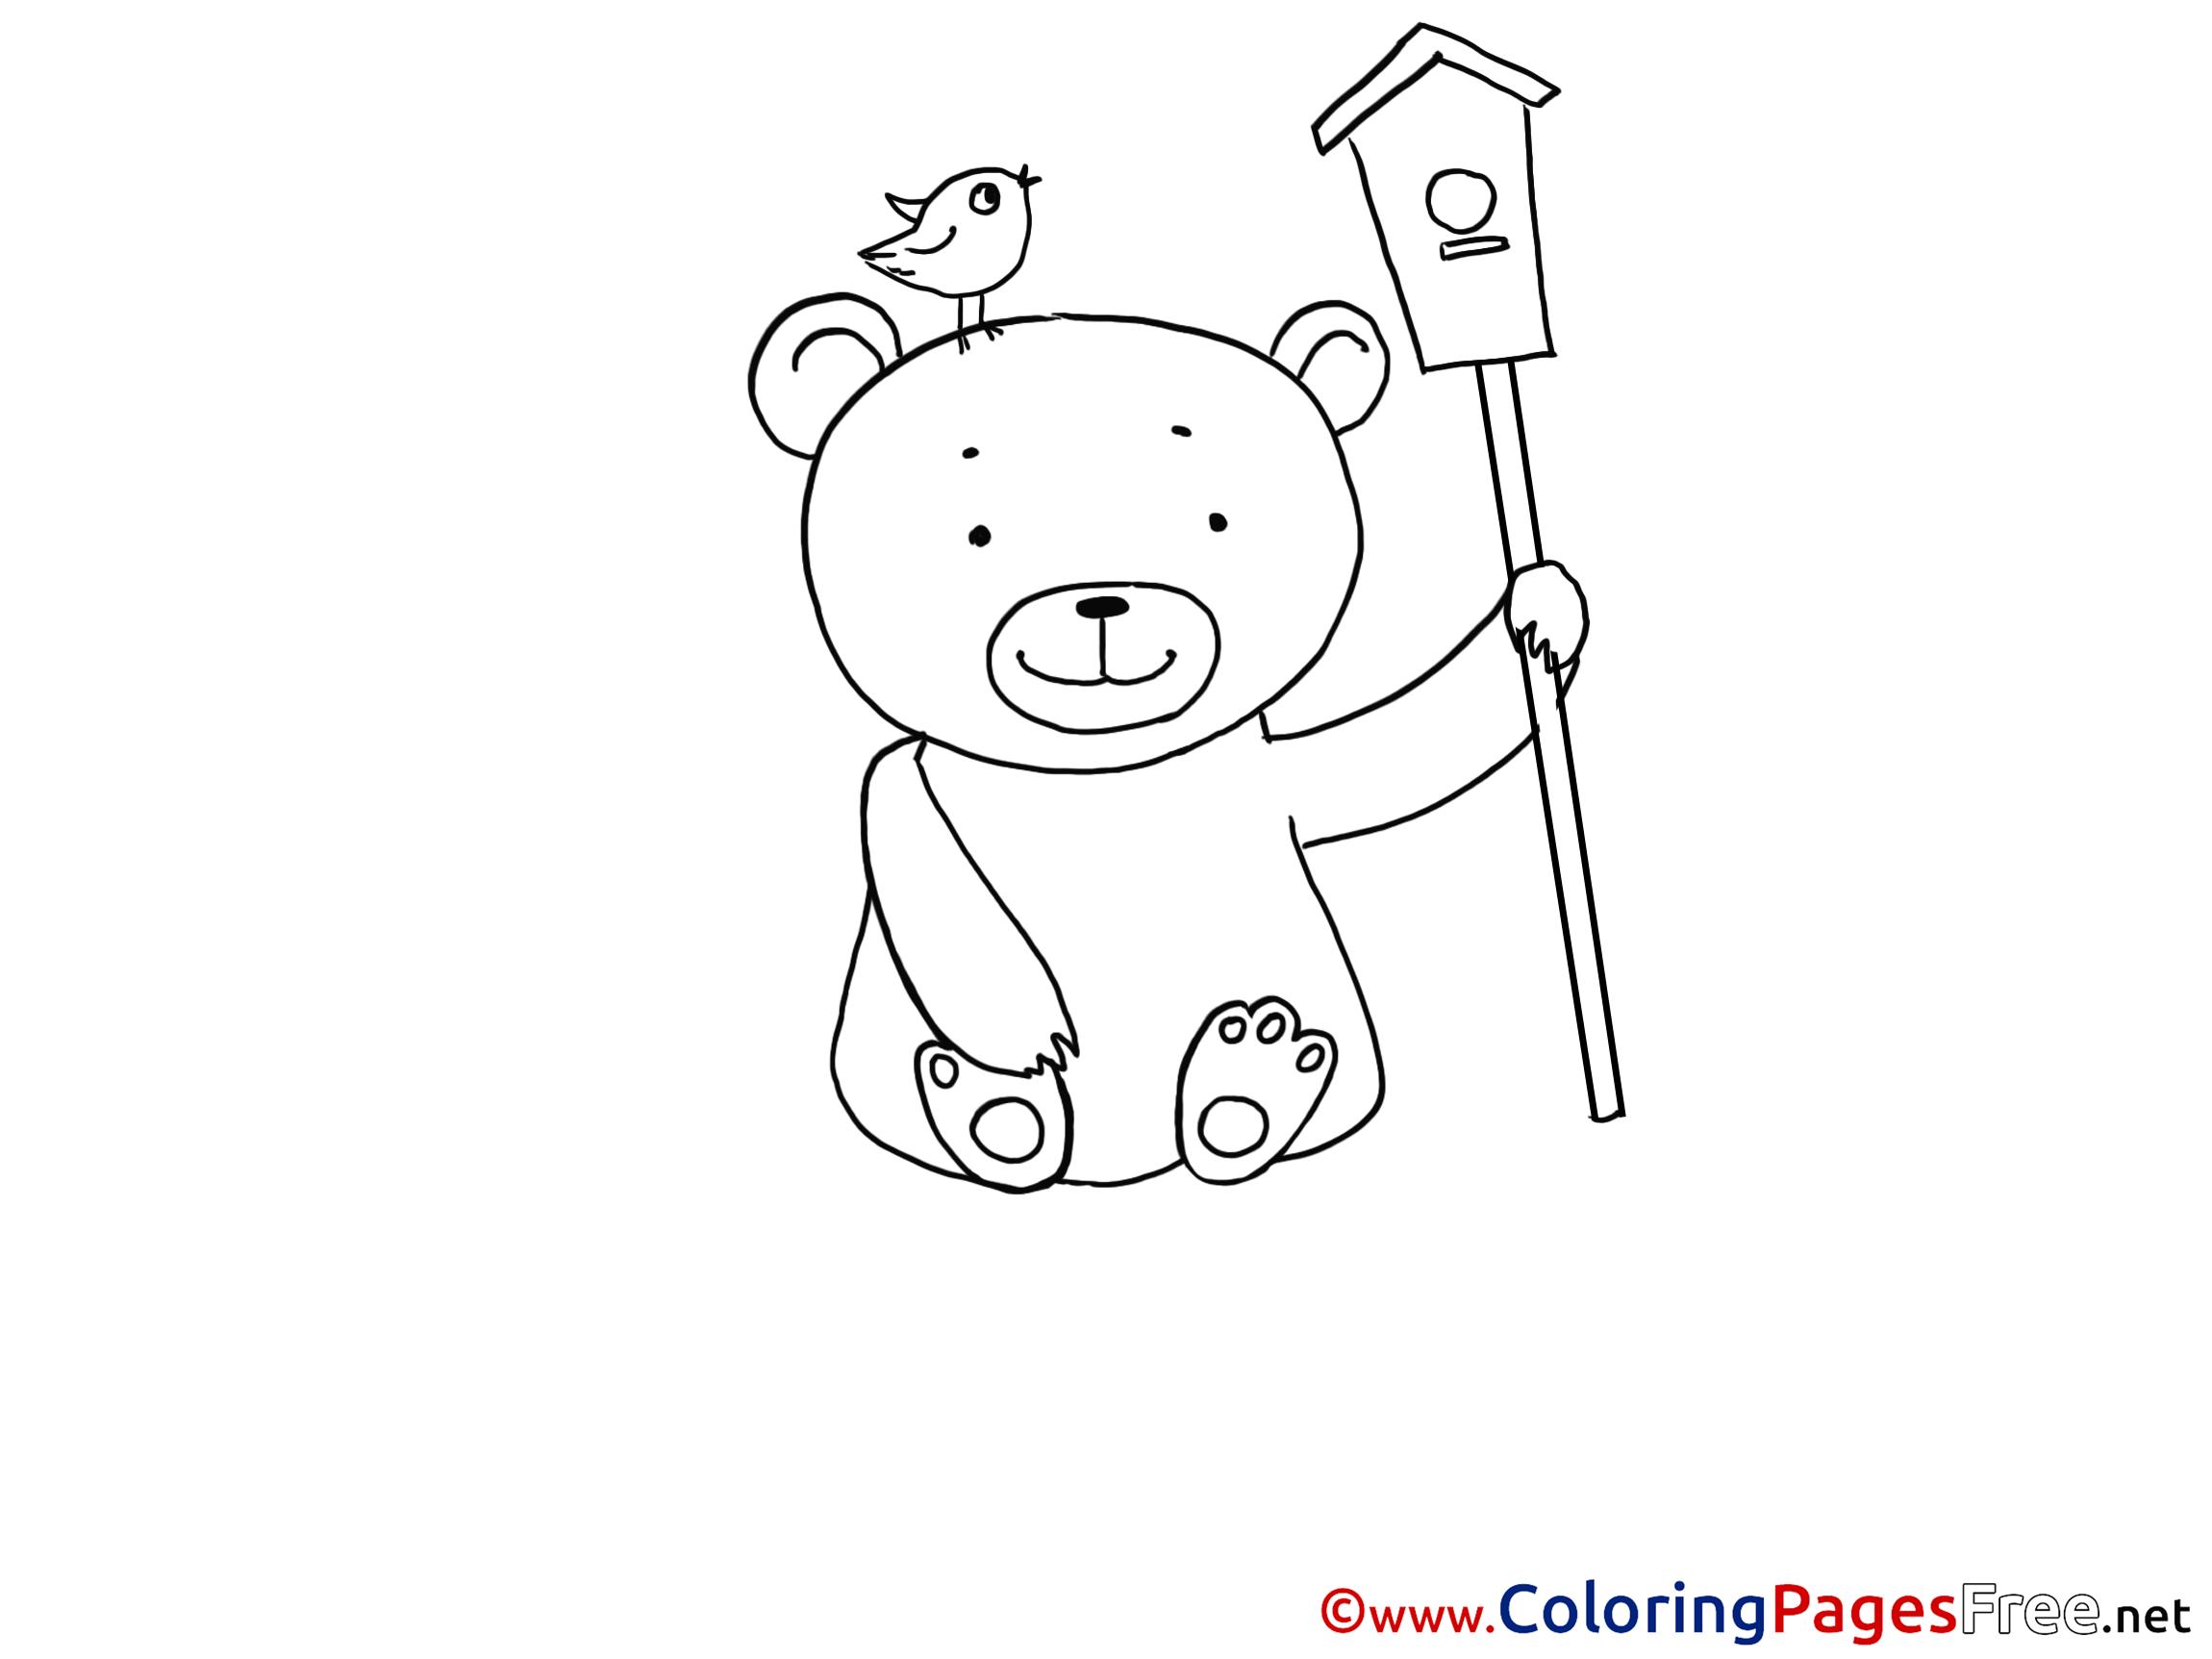 Birdhouse coloring sheet - Birdhouse Coloring Sheet 24